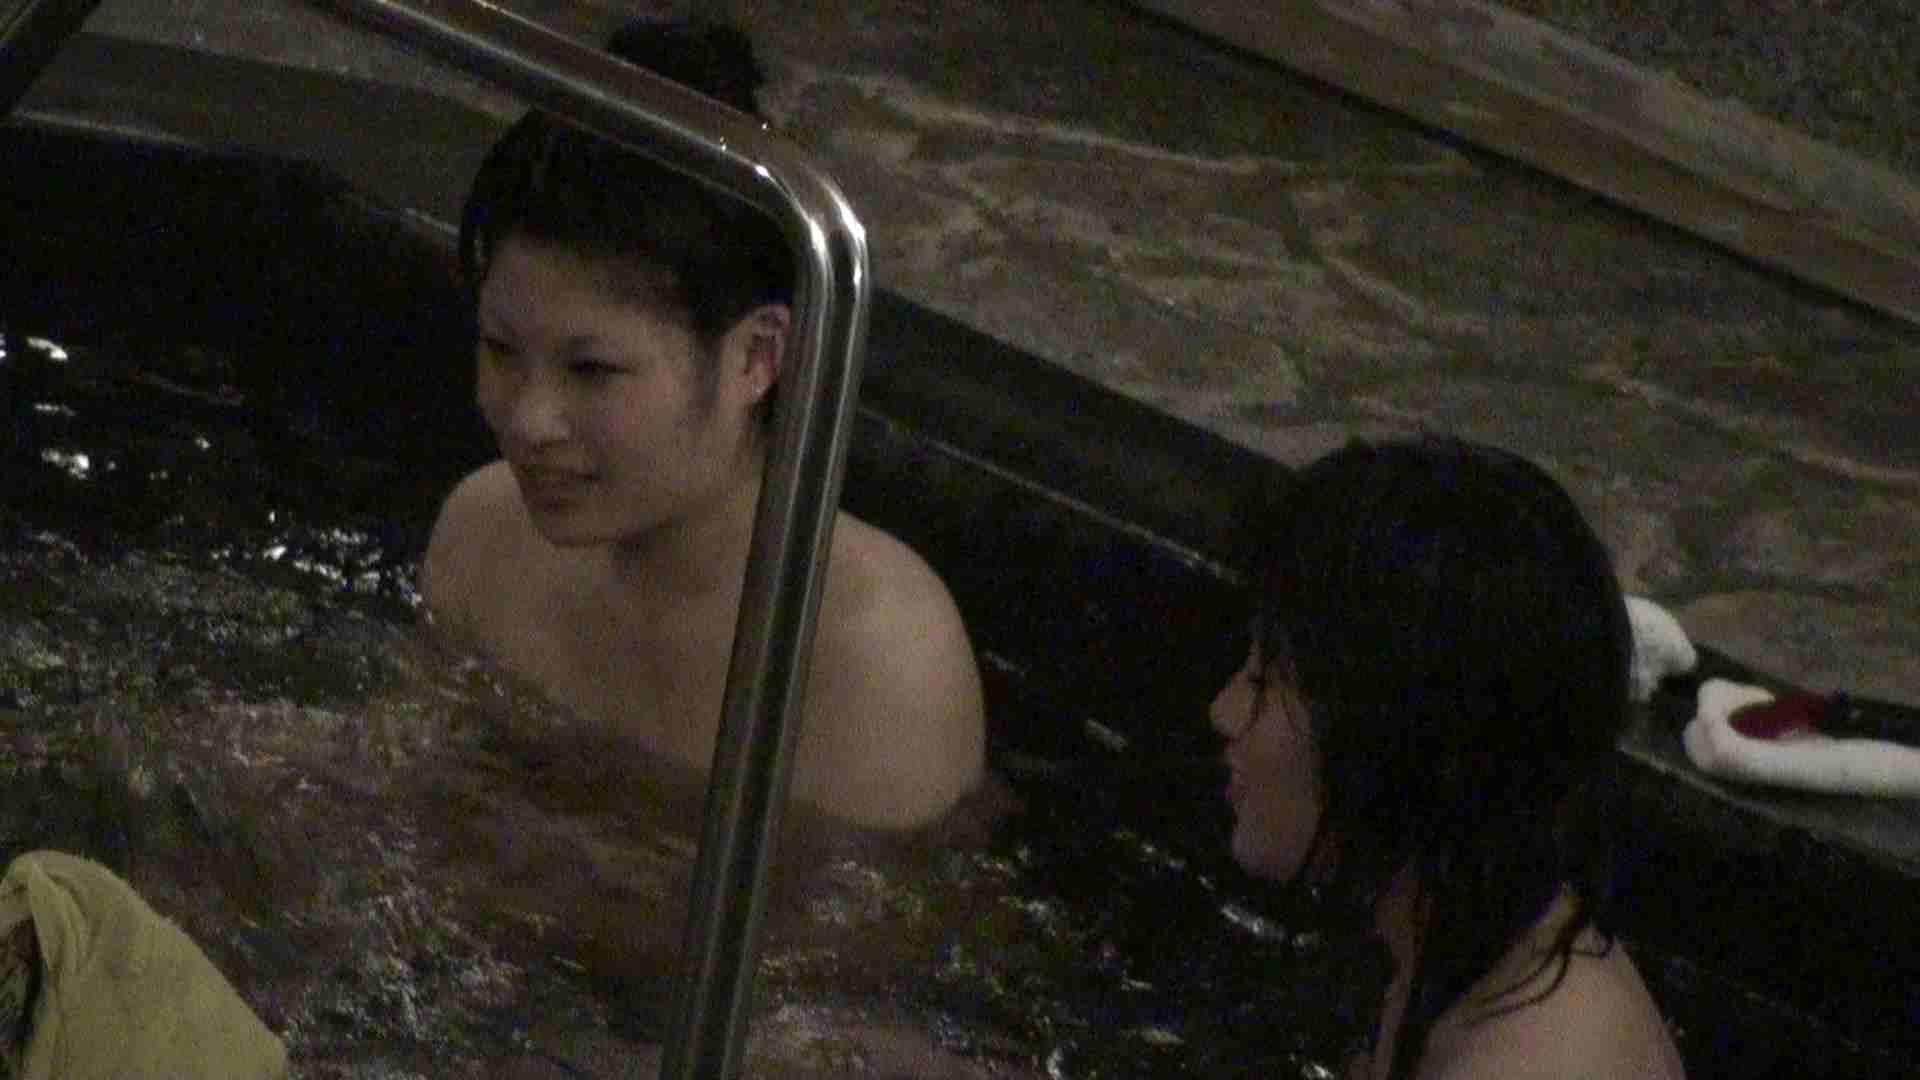 Aquaな露天風呂Vol.350 盗撮   HなOL  73pic 24